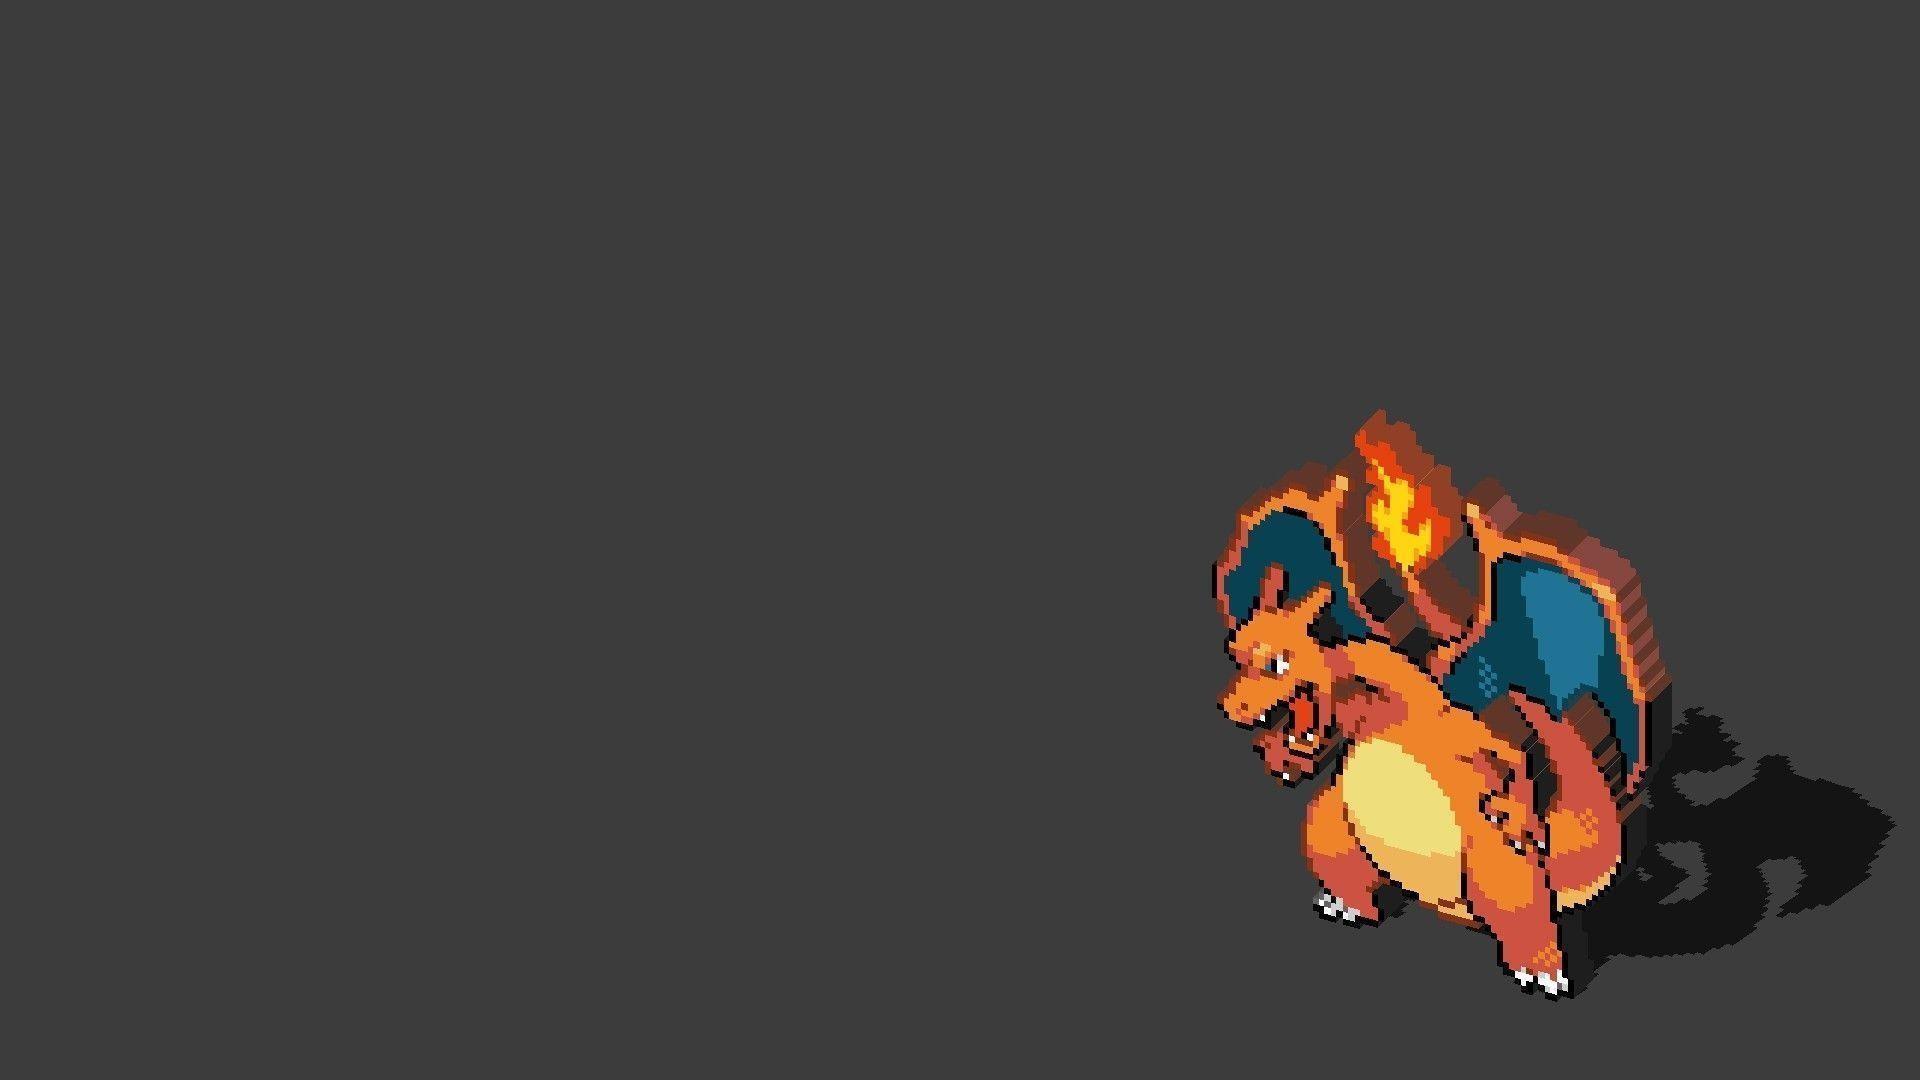 Res: 1920x1080, Pokemon Charizard wallpaper - 878080